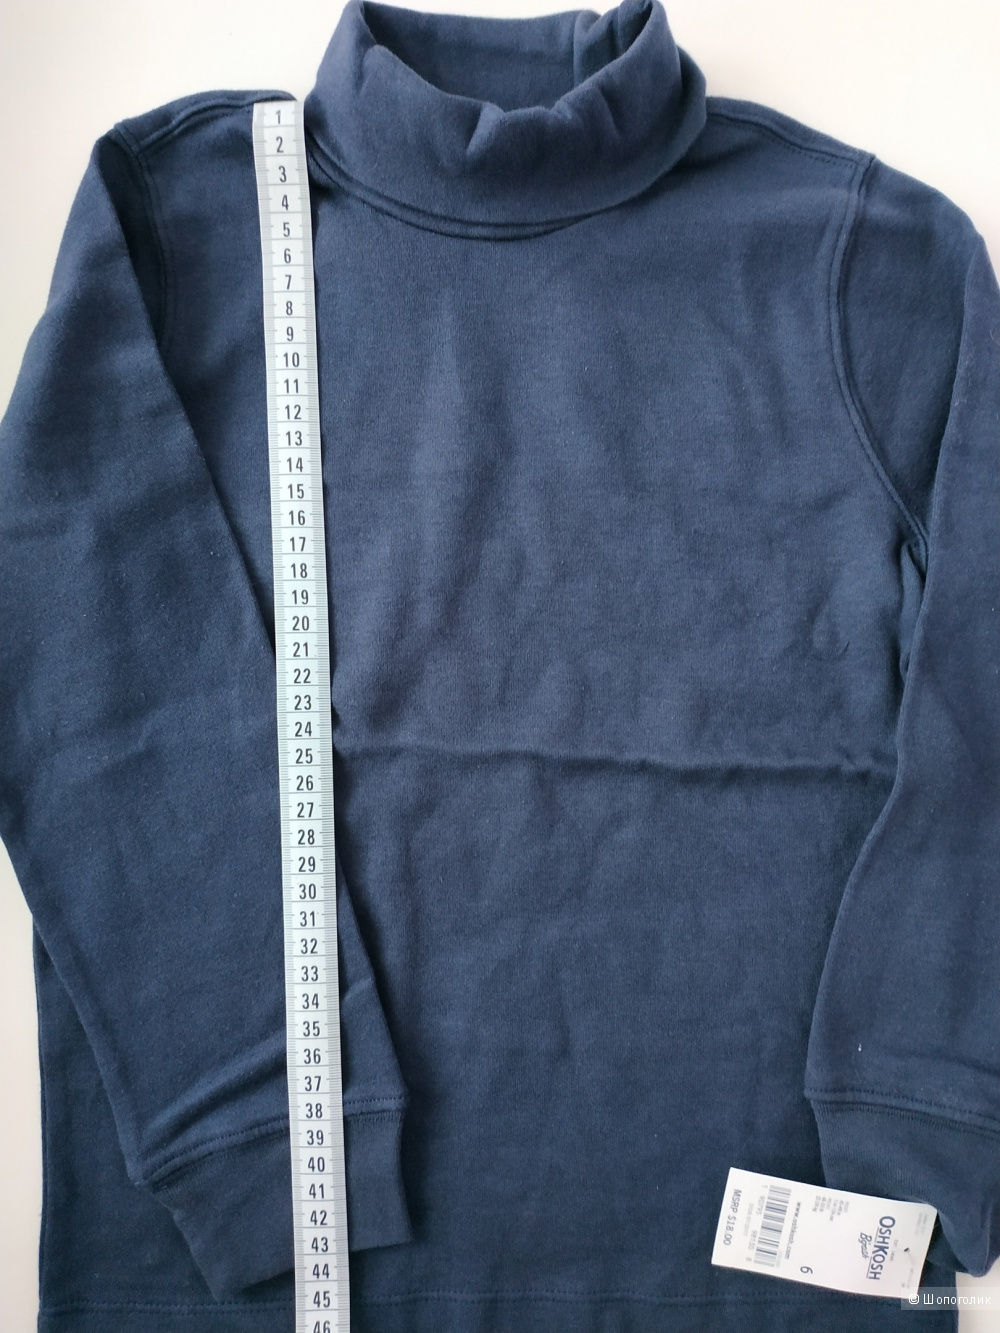 Водолазка OSHKOSH B'GOSH, размер 6 (114-122 см)